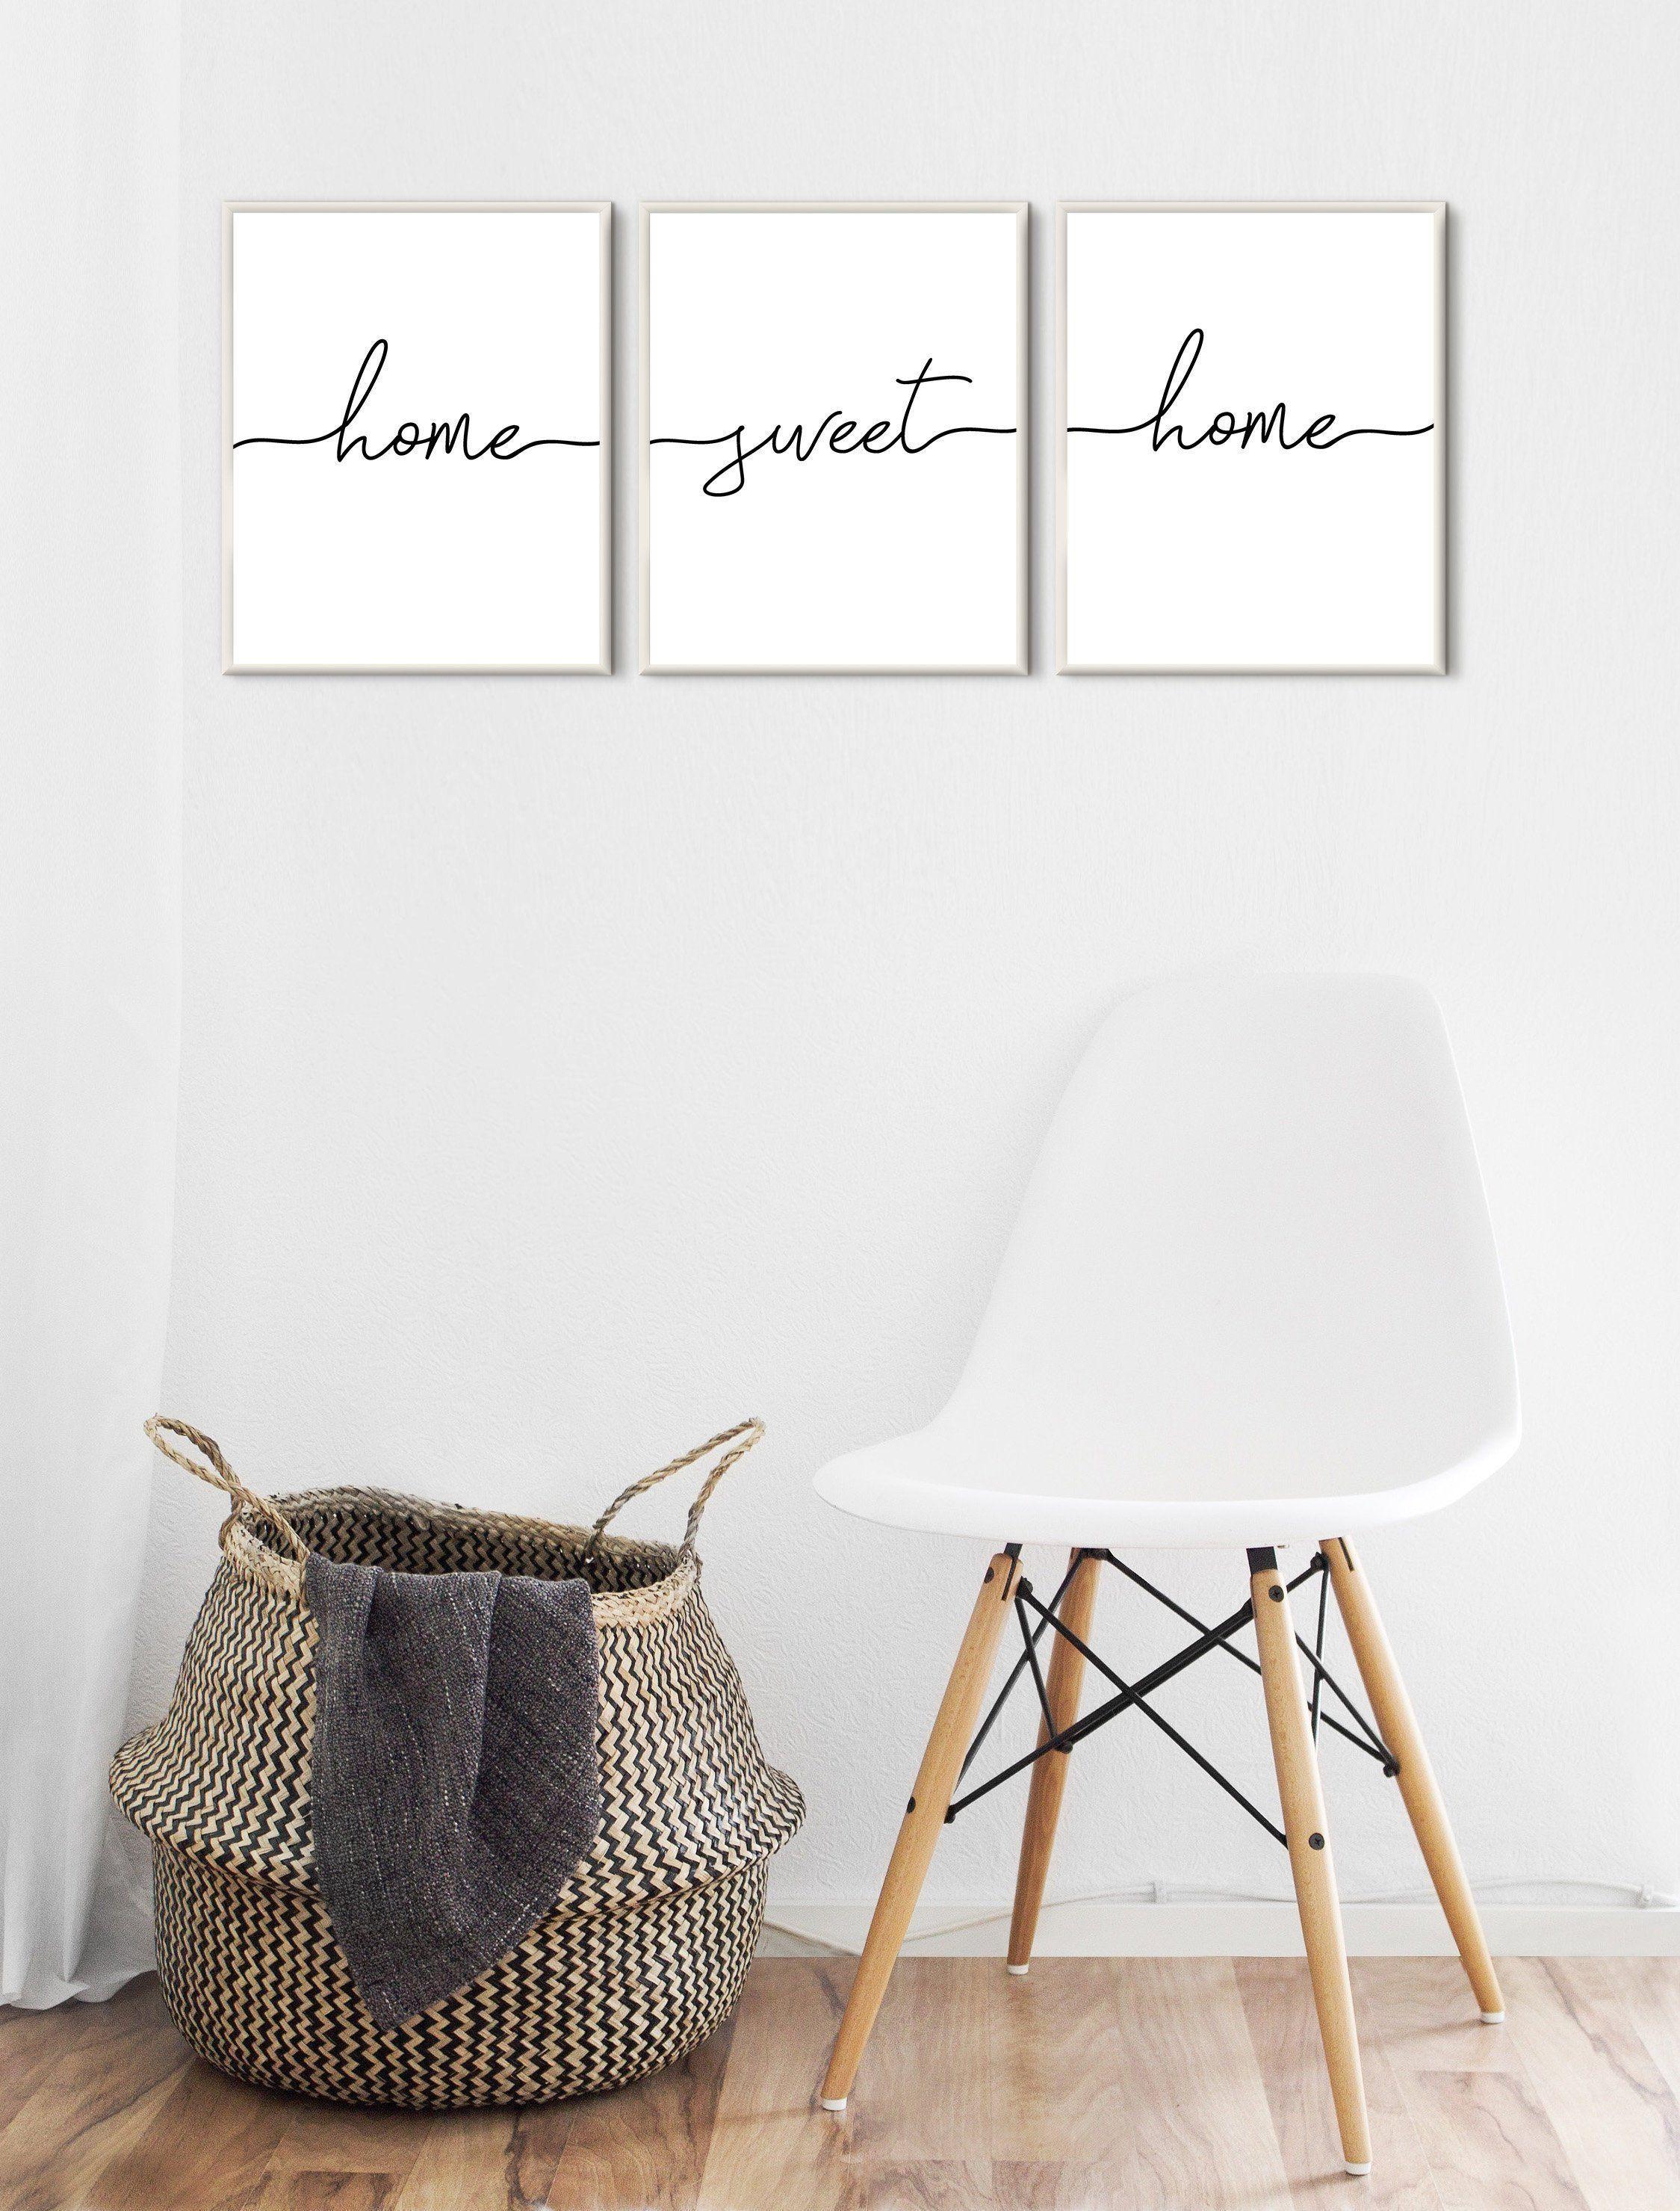 home sweet home print wall art set of 3, wall decor living room modern, Scandinavian print minimalist, gallery wall printable, hallway print images